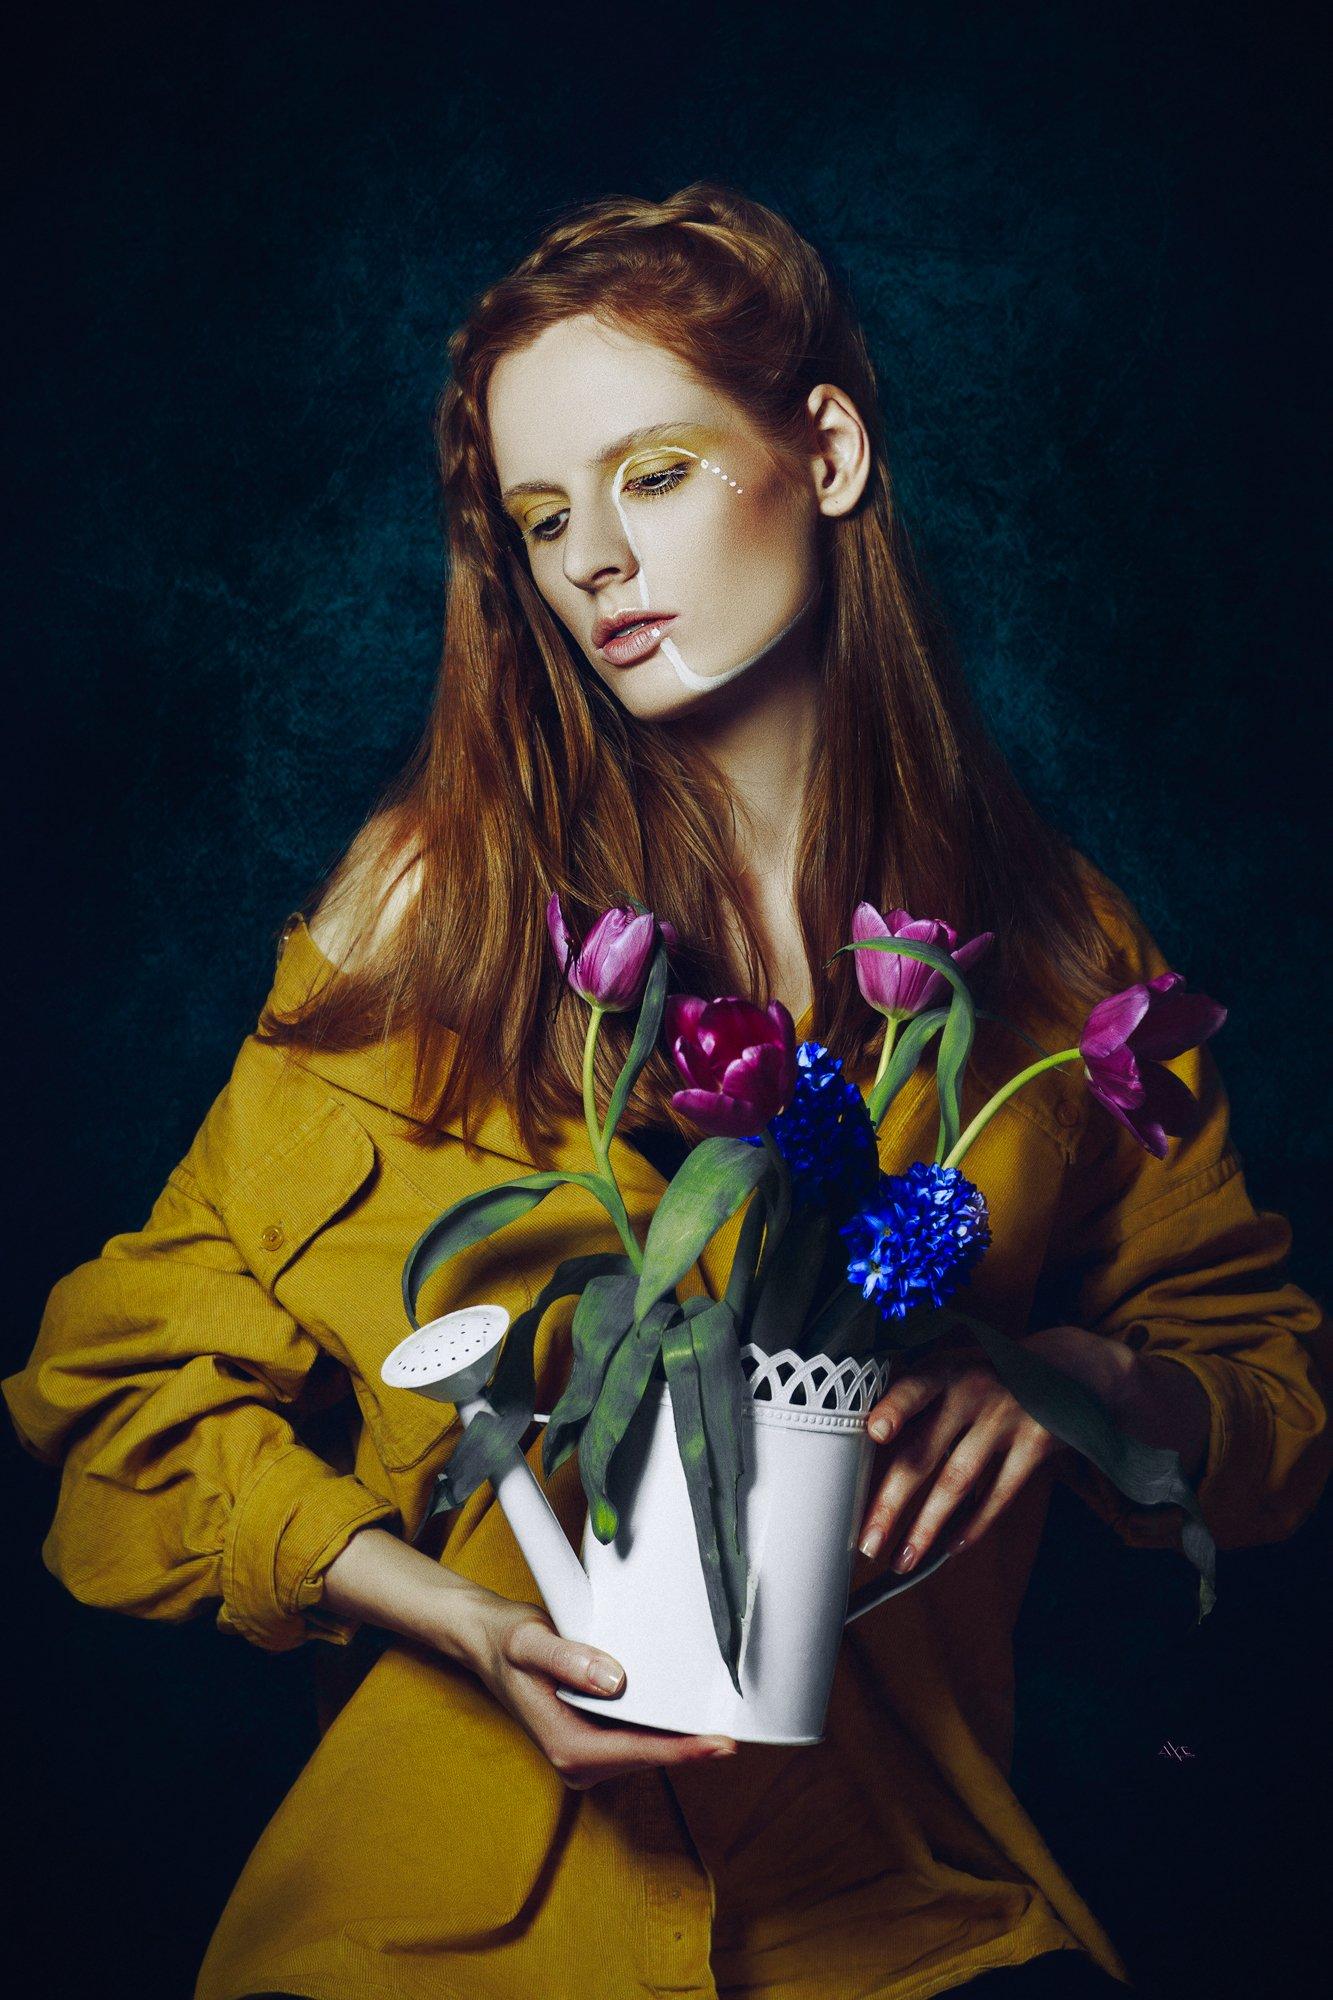 woman, portrait, studio, art, Руслан Болгов (Axe)